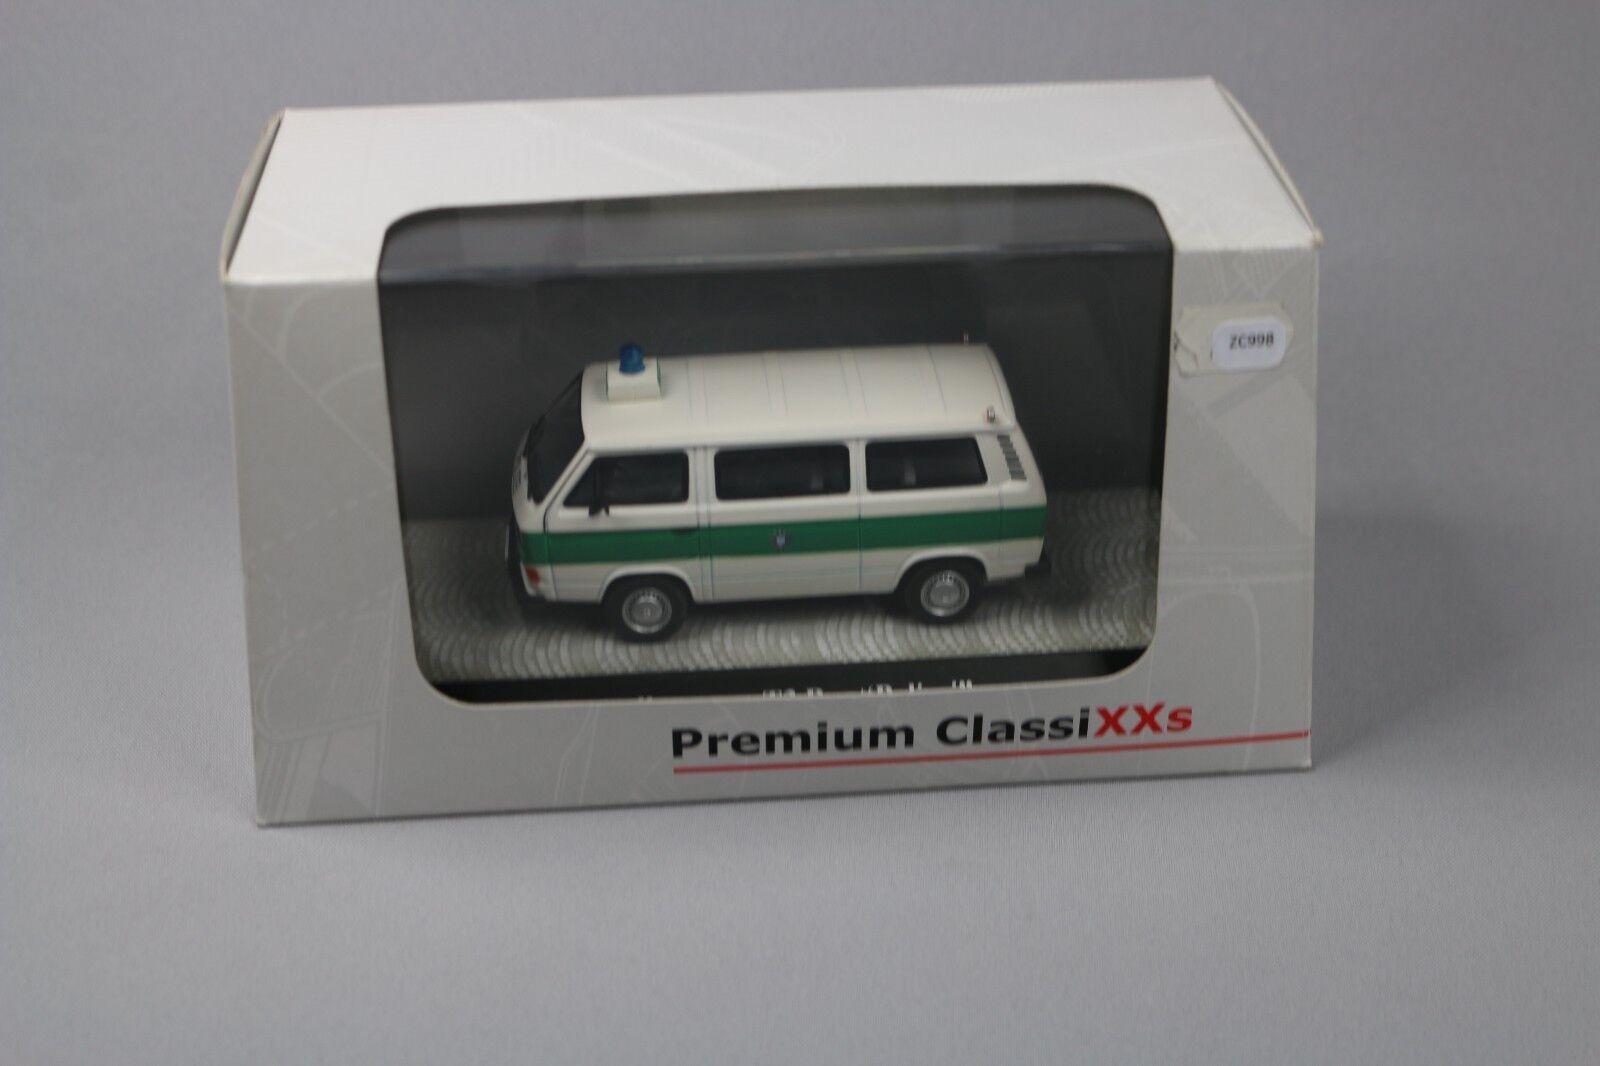 ZC998 Premium ClassiXXs 11458 Miniature fourgon 1 43 Volkswagen T3 Bus Polizei